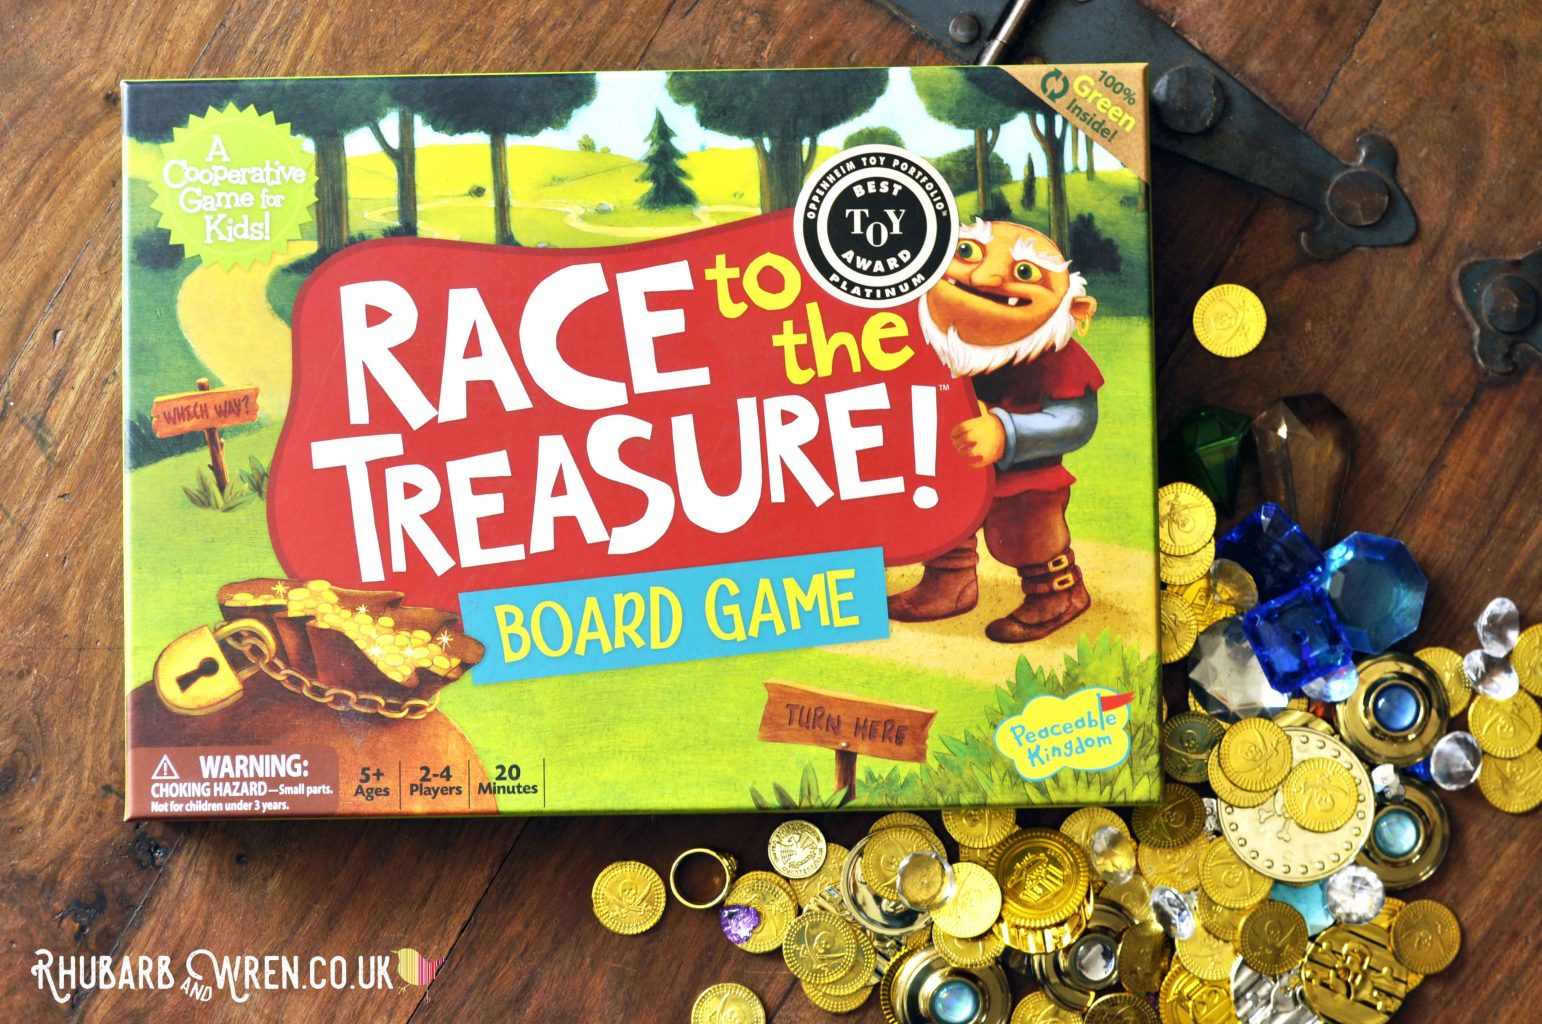 Peaceable Kingdom board game 'Race to the Treasure'